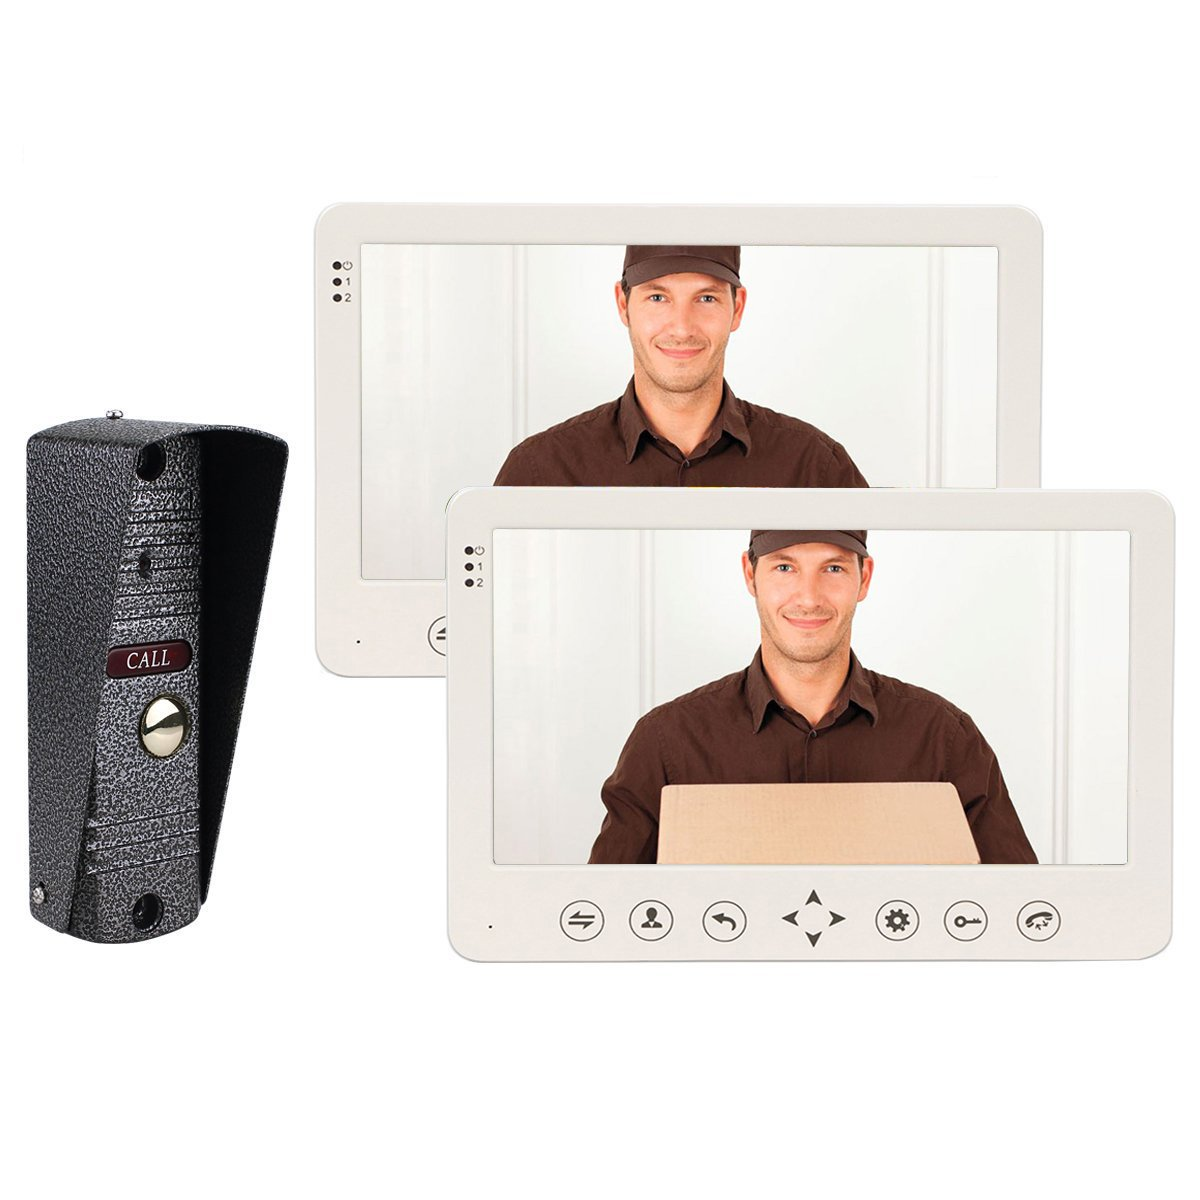 TIVDIO CP80 Video Door Phone Intercom System IP65 Waterproof Night Vision Doorbell Intercom with 1 IR Night Doorbell Camera and 2 Hands Free Monitor Intercom Doorbell (2 Monitor 1 Camera)